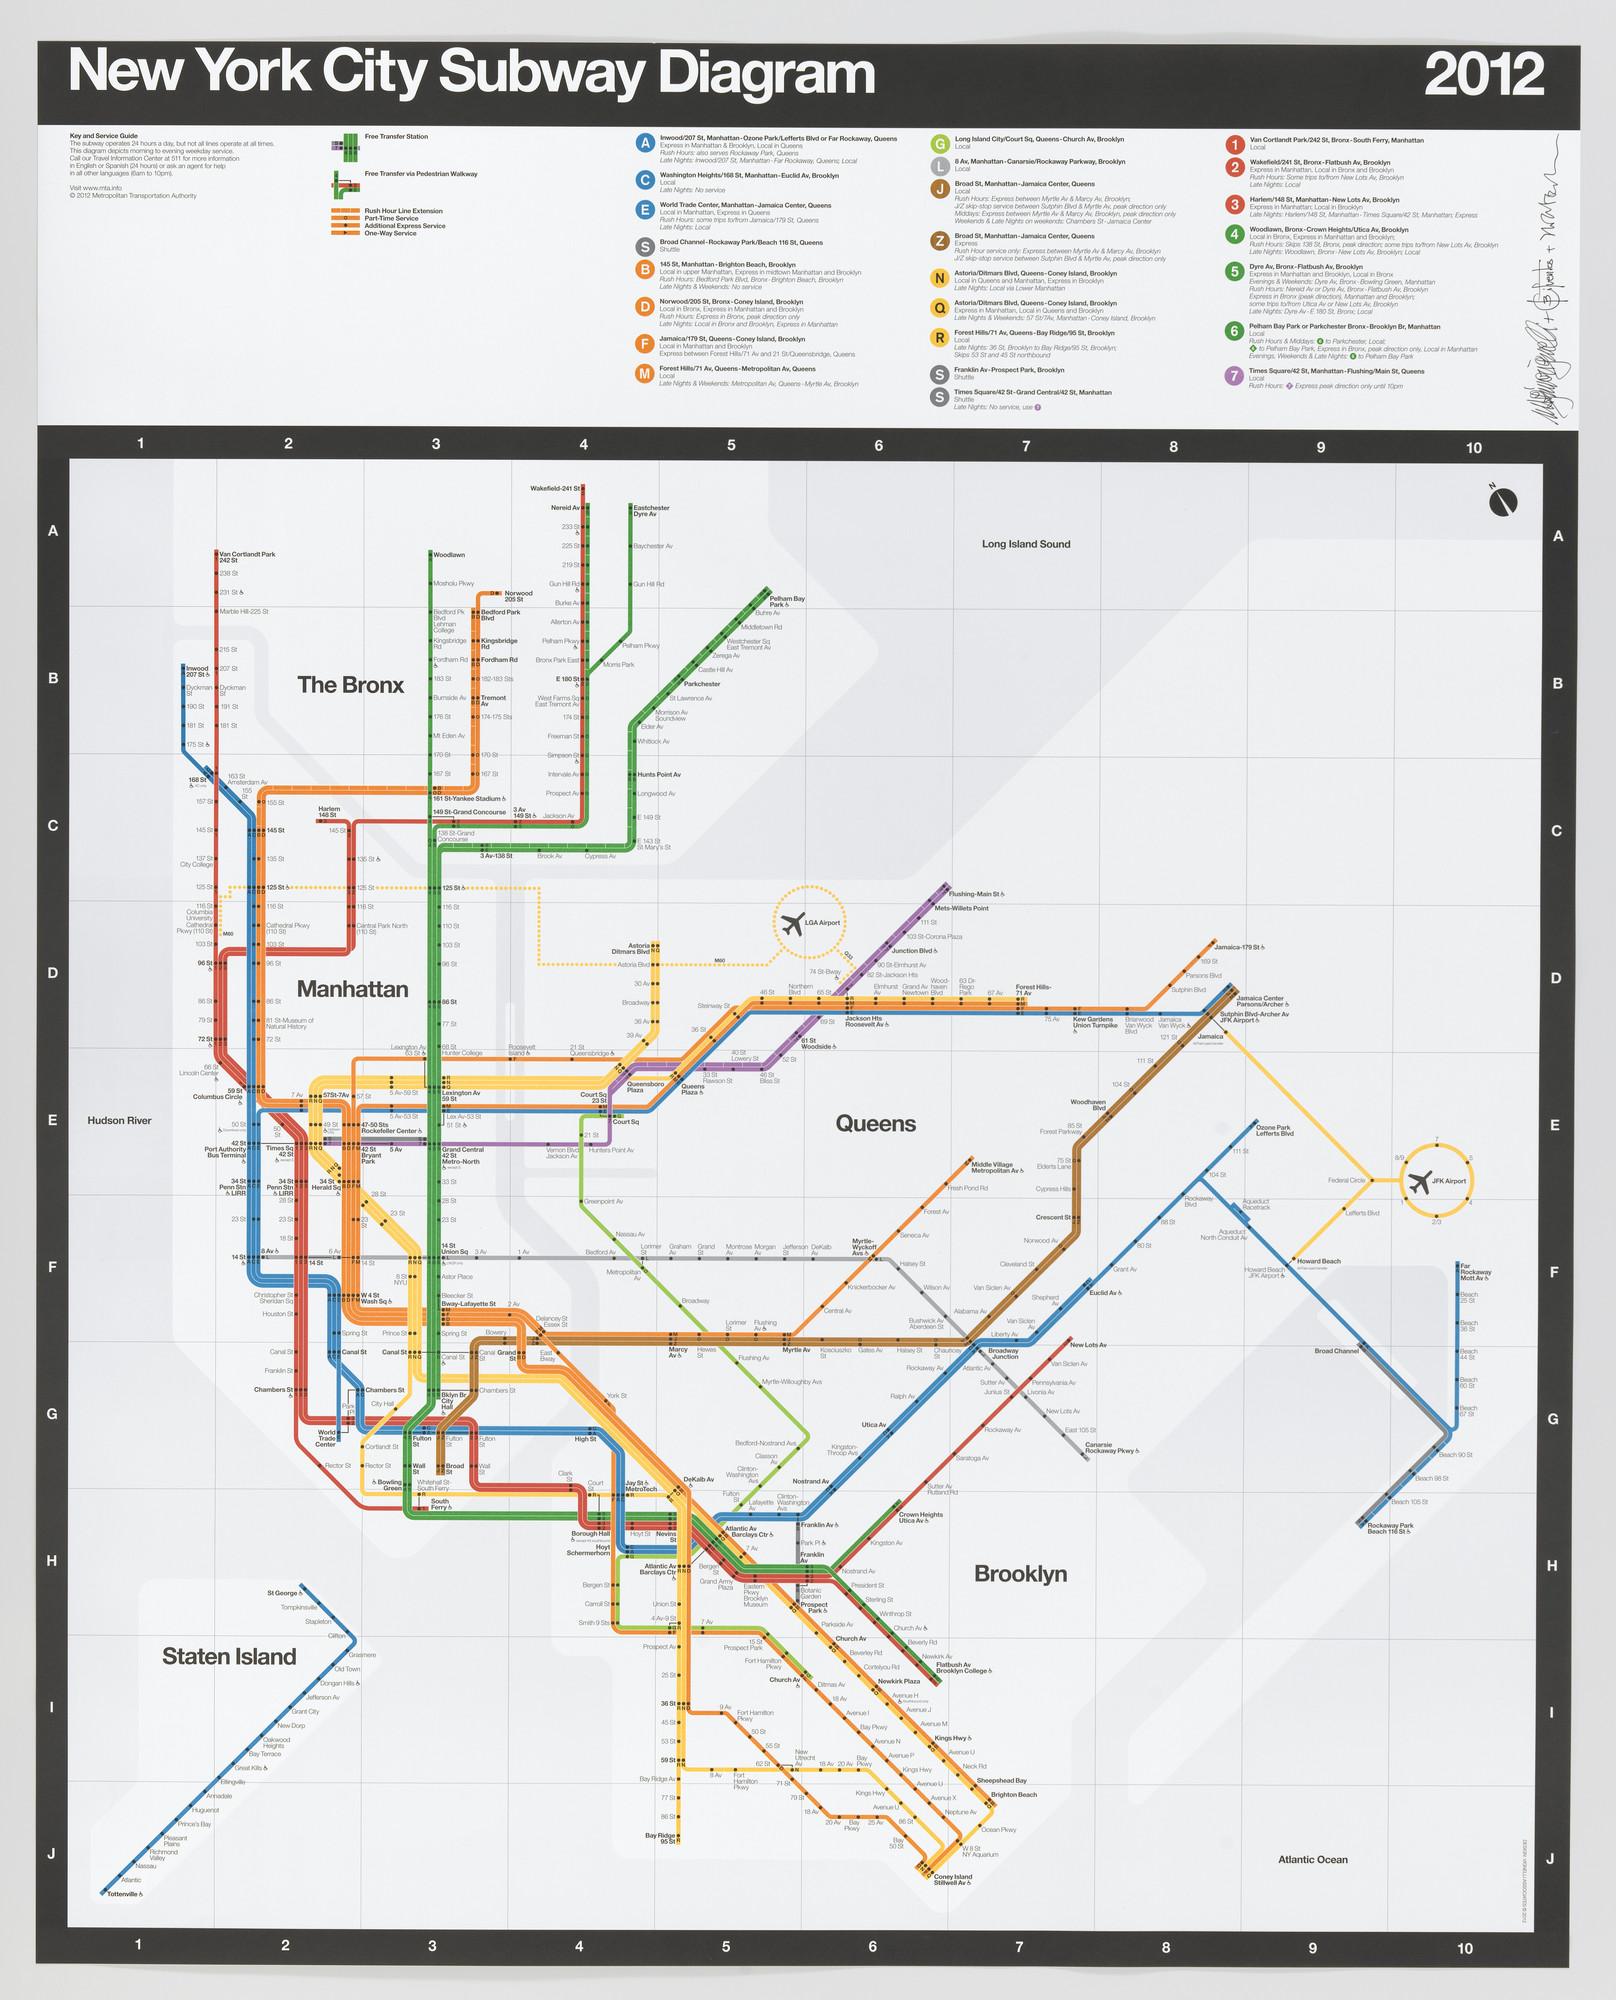 Nyc Subway Map By Vignelli.Massimo Vignelli Beatriz Cifuentes Yoshiki Waterhouse New York